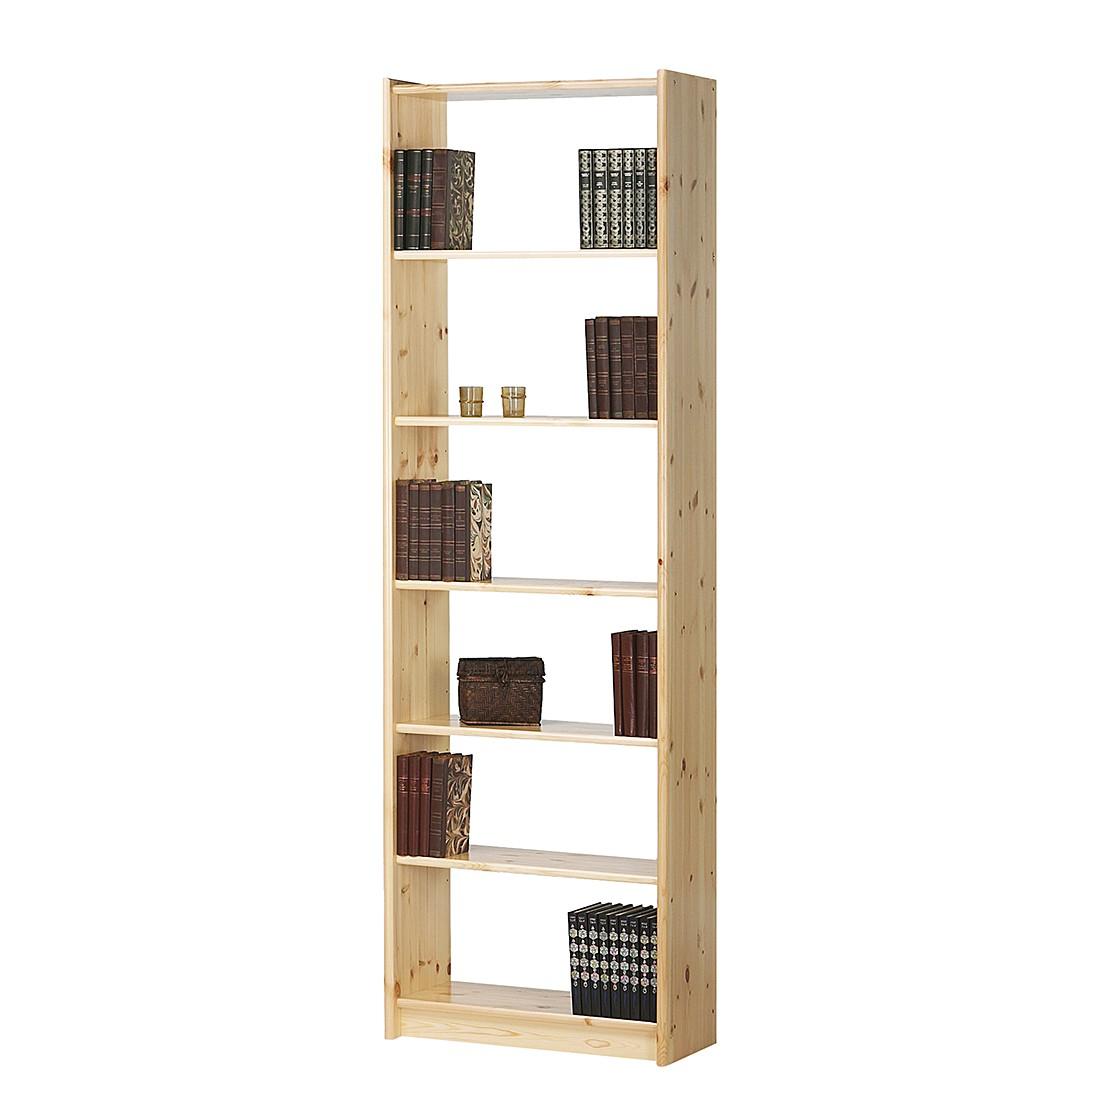 home24 Buecherregal Tomke III | Wohnzimmer > Regale > Bücherregale | Beige | Massivholz | Steens